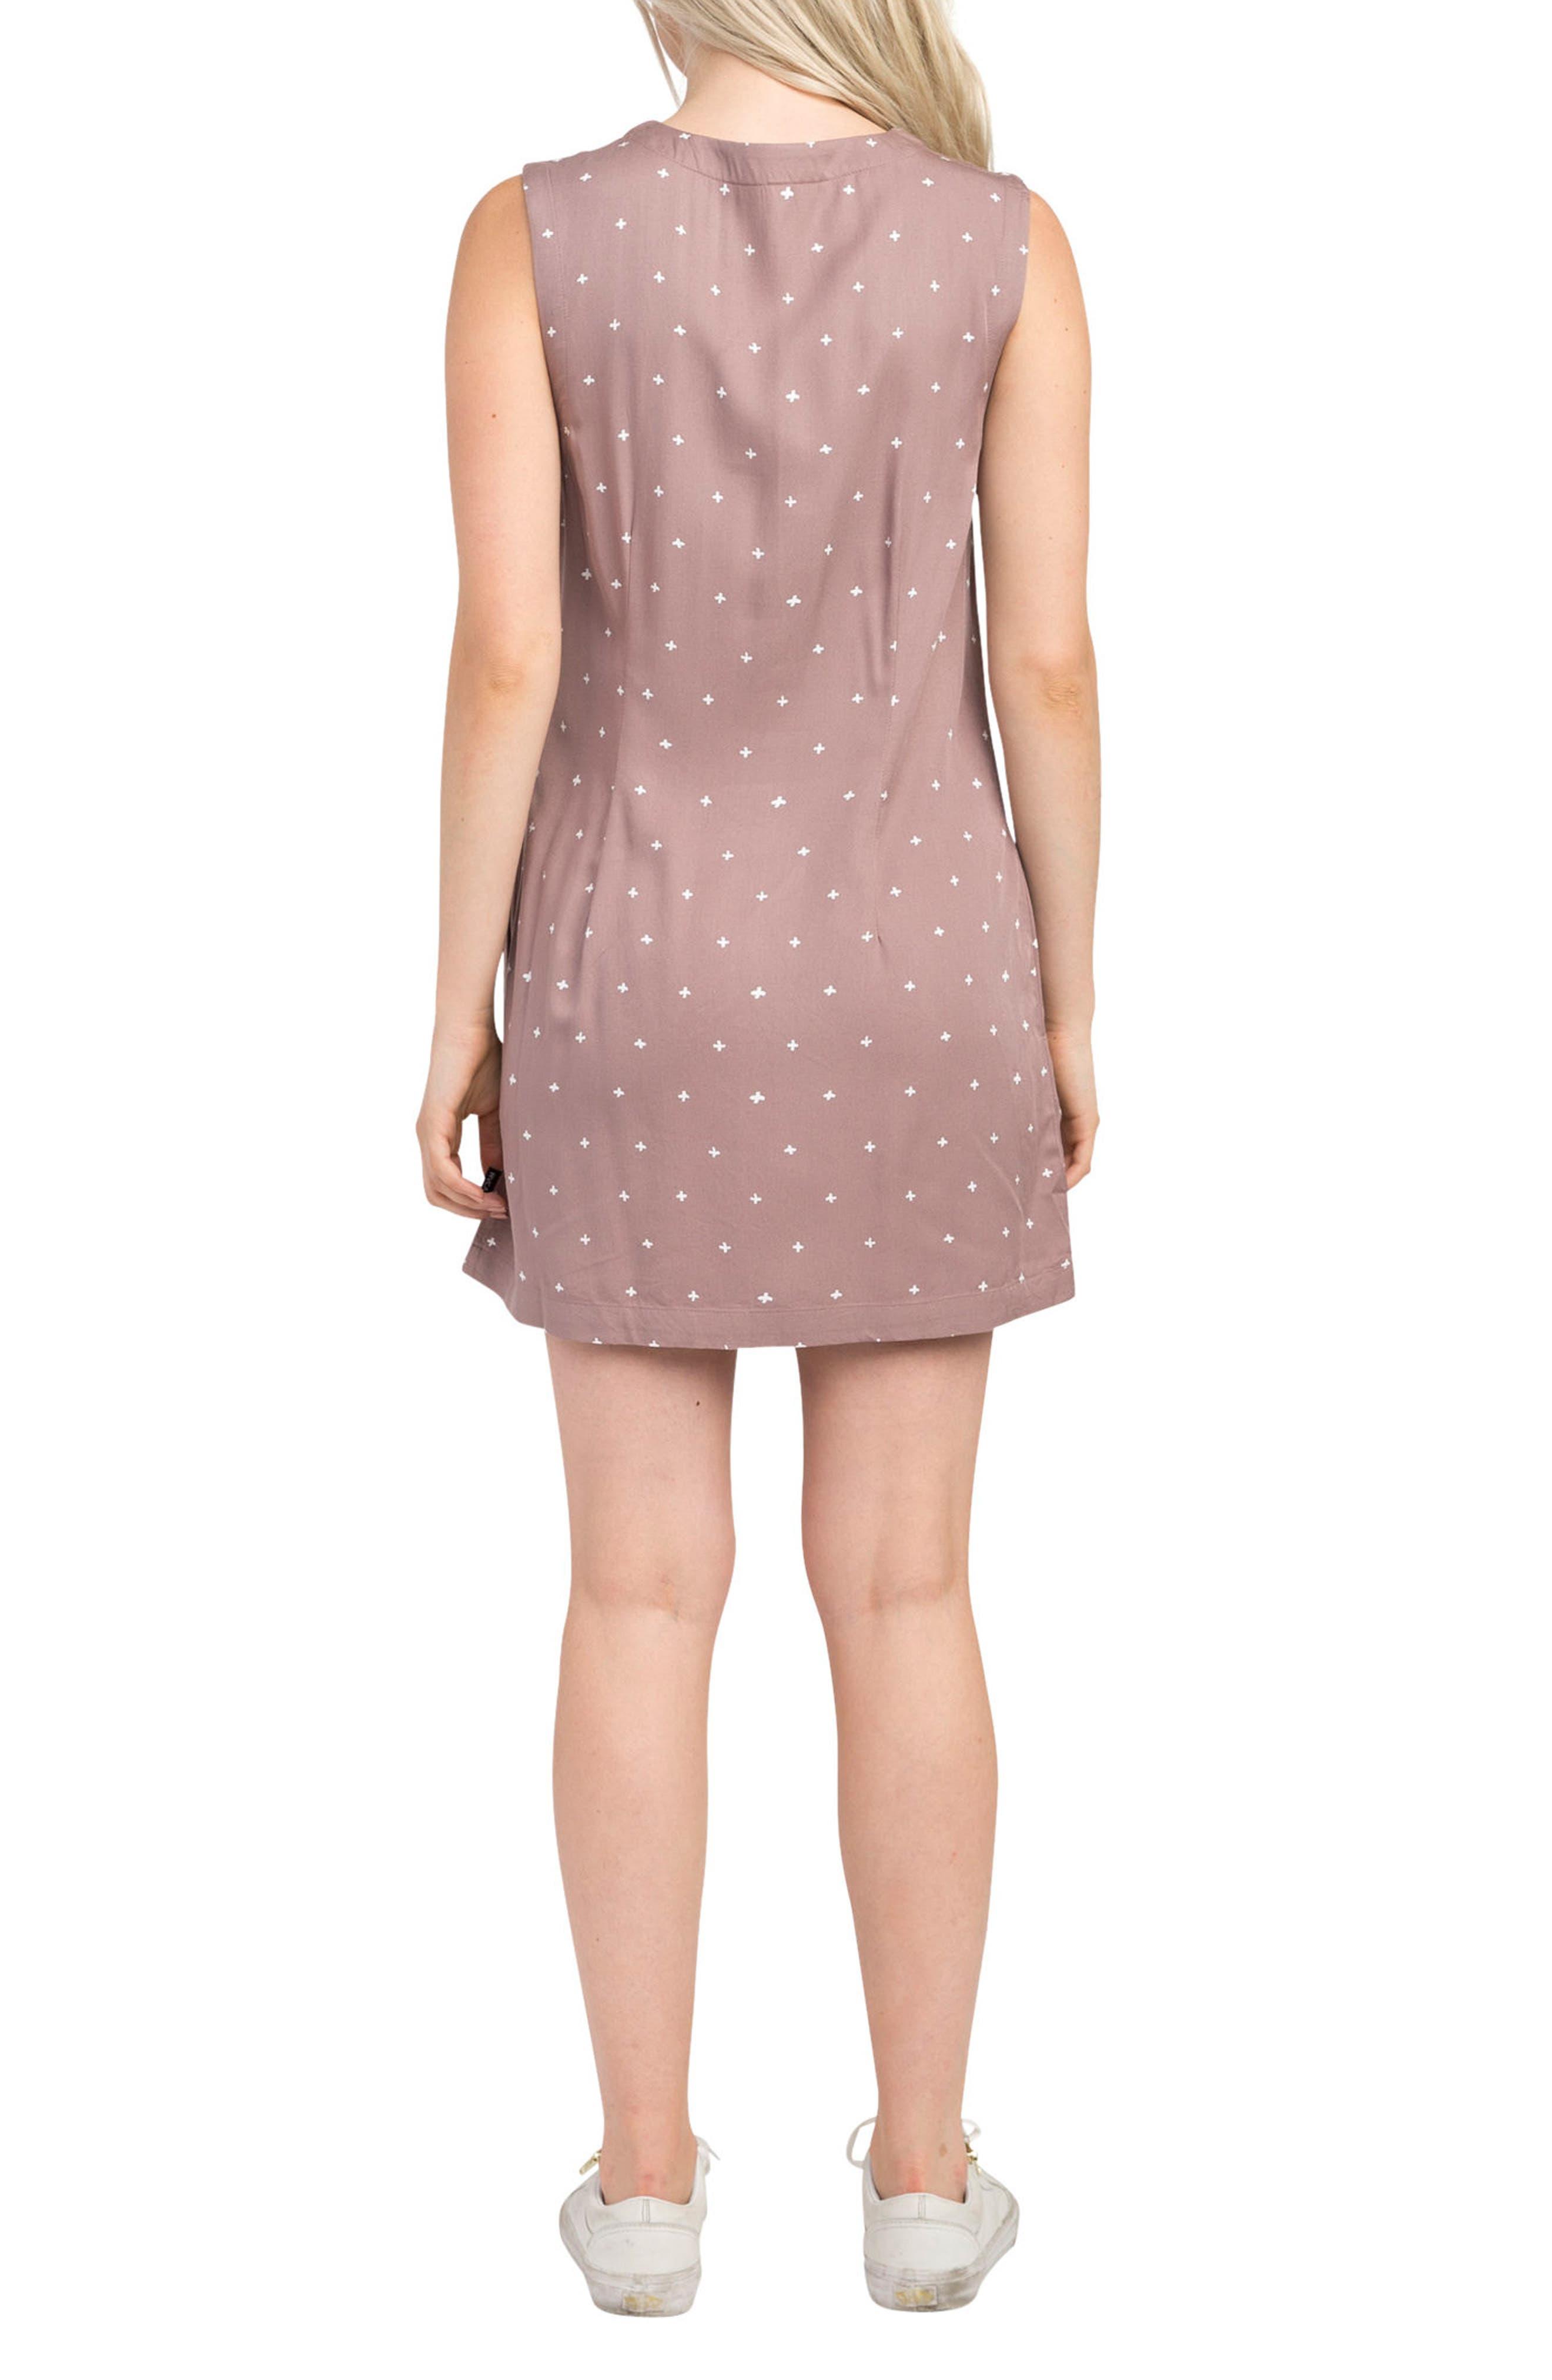 Fairness Print Dress,                             Alternate thumbnail 2, color,                             652